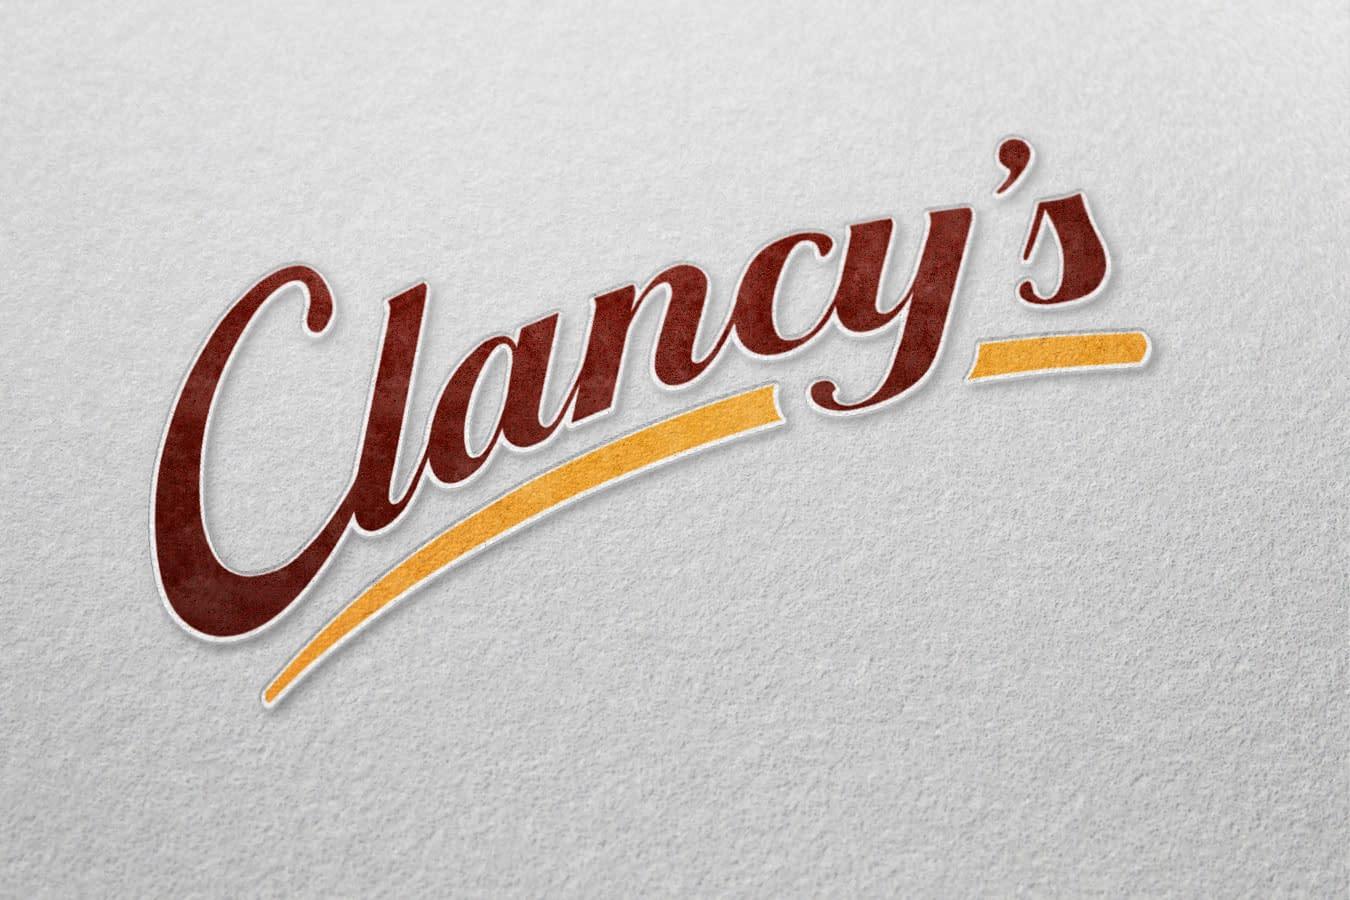 logos_clancys2